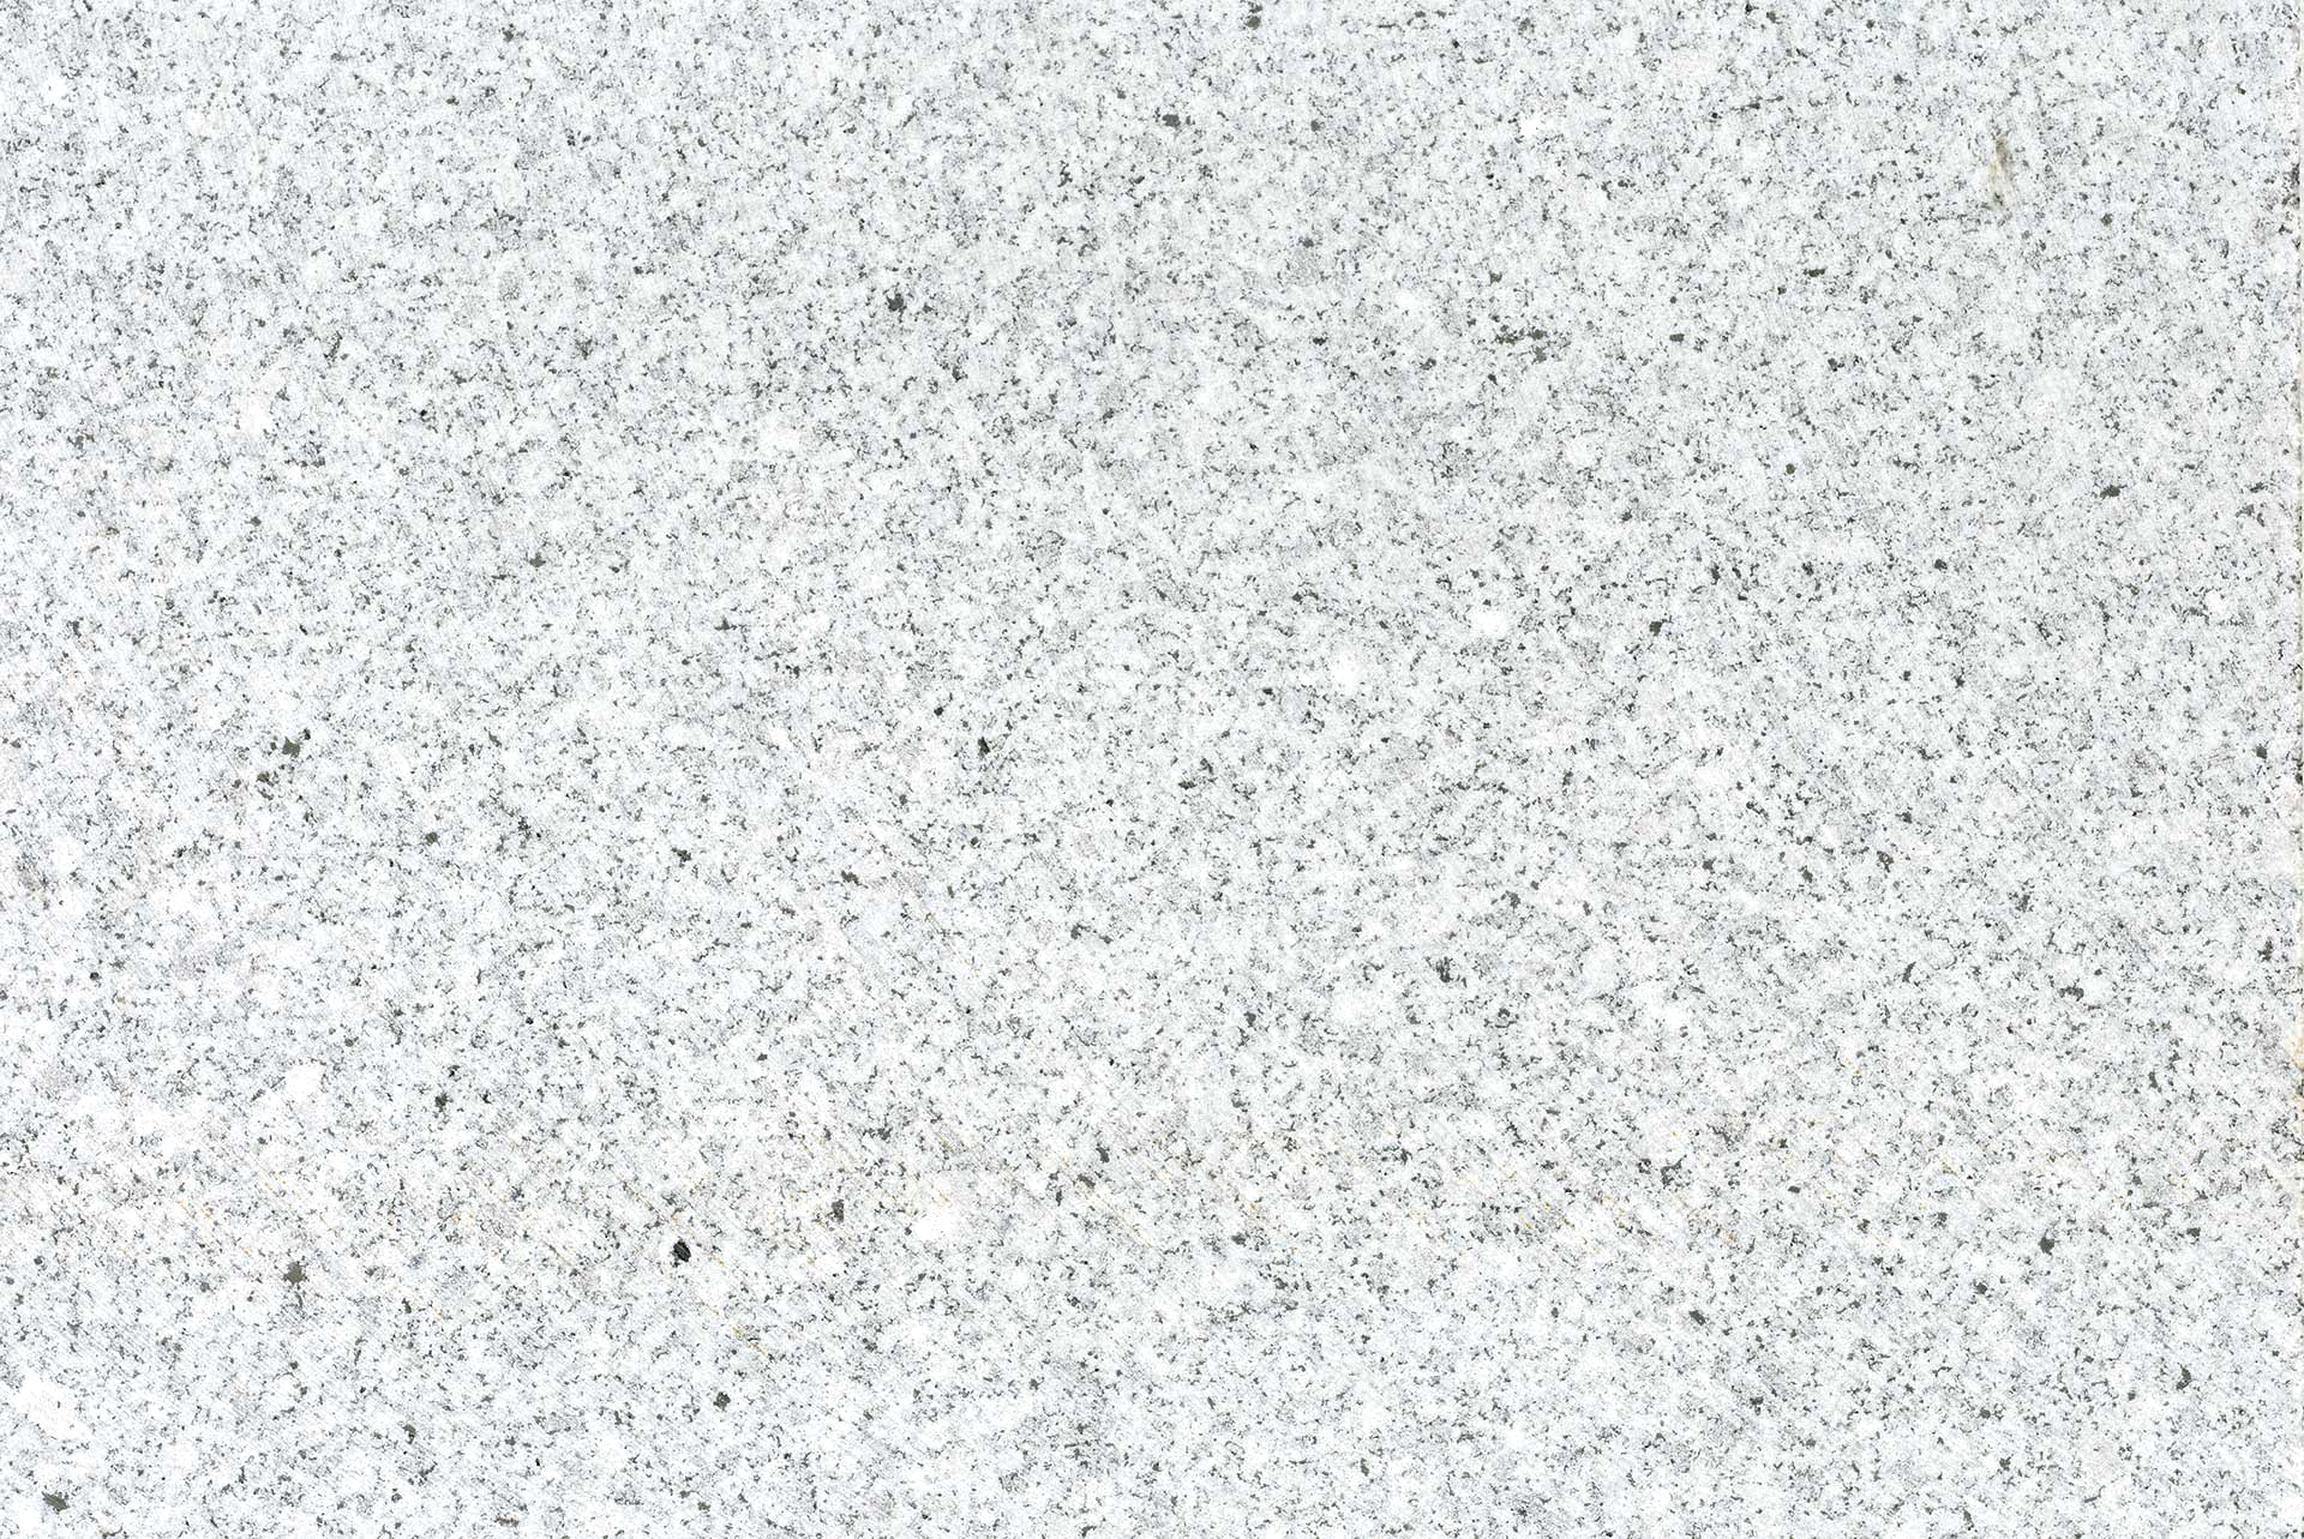 pierre granit d'occasion